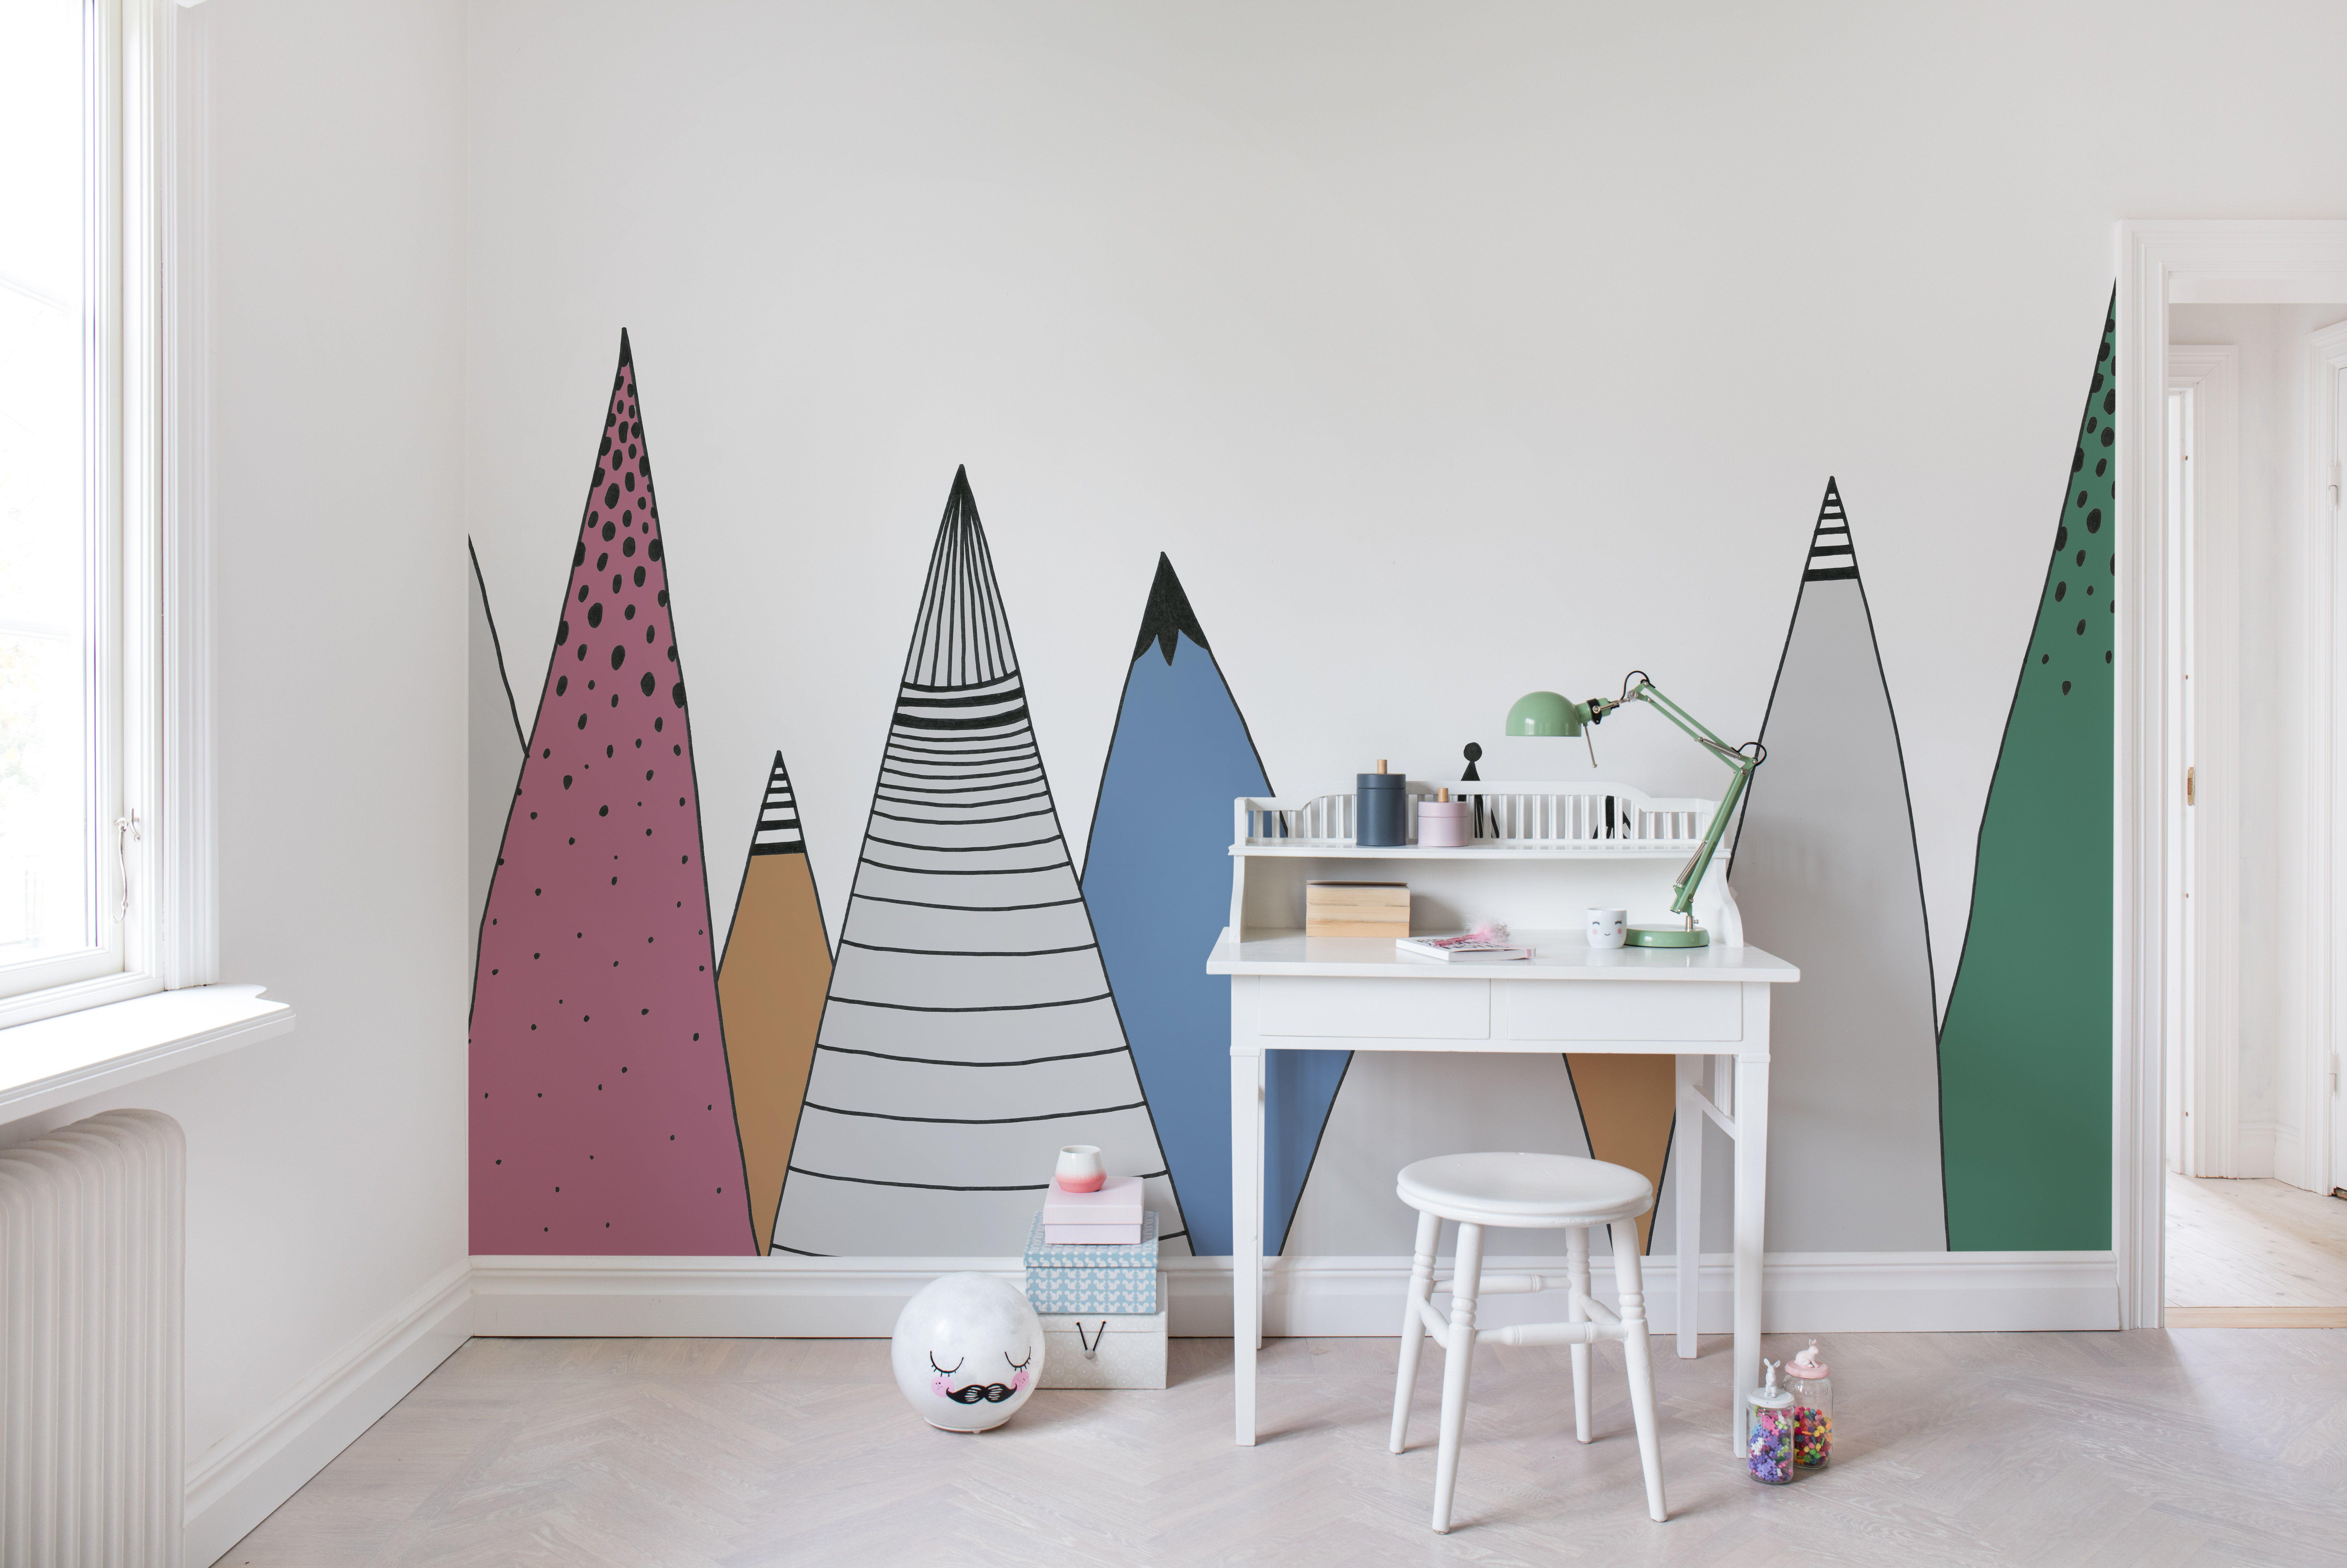 Kinderzimmer wandfarbe mountain ridge color  kid bedroom inspiration  pinterest